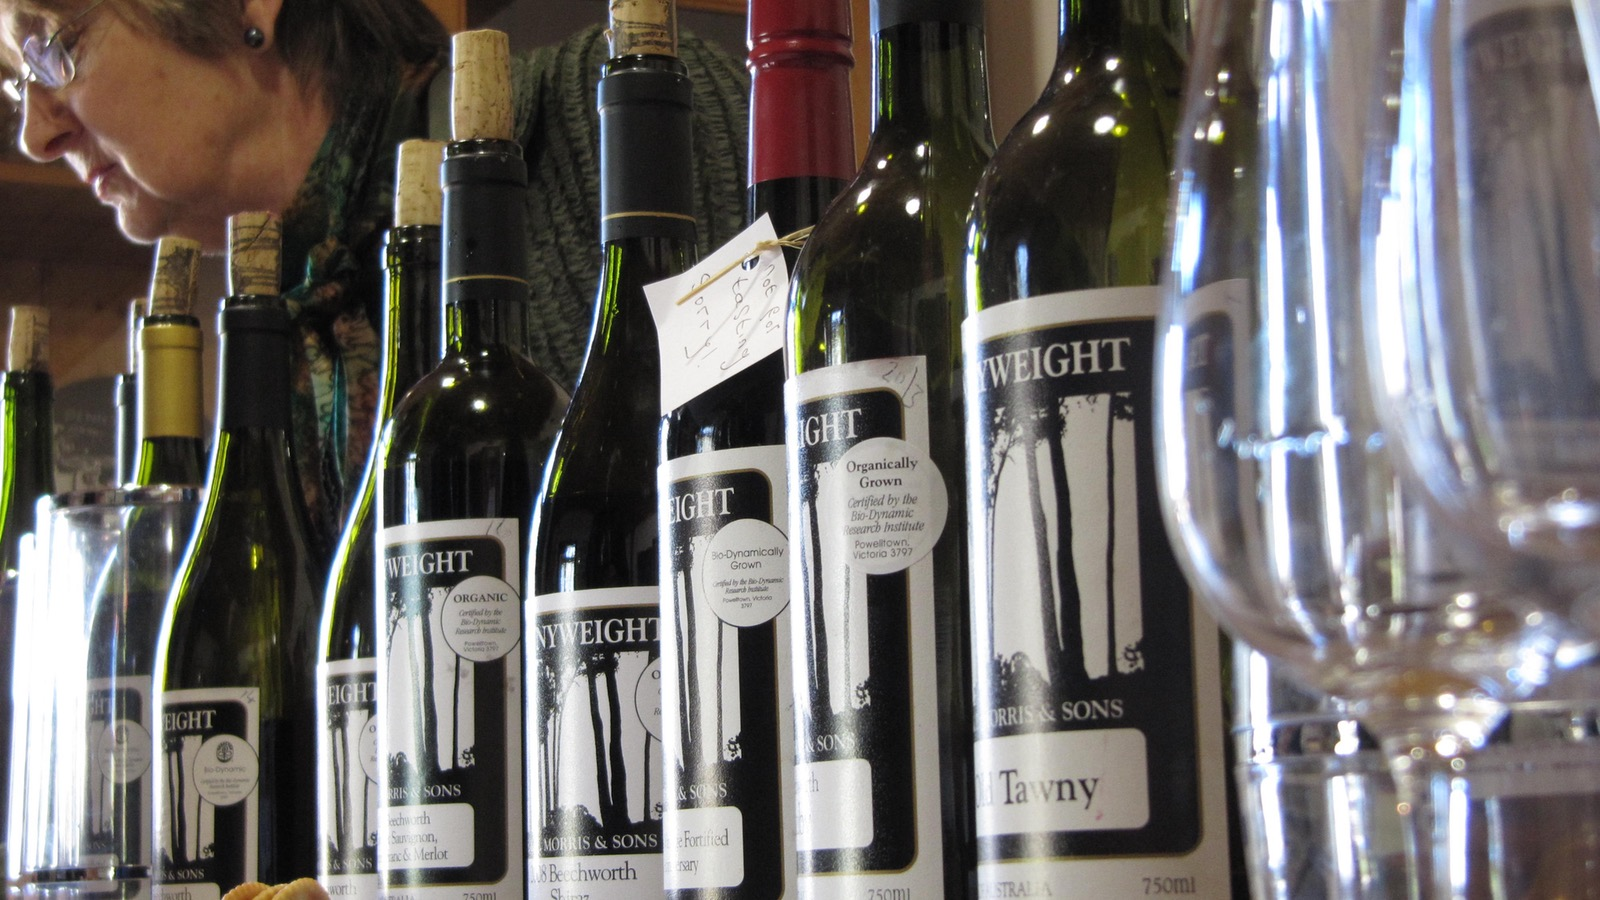 Wine tasting at Pennyweights in Beechworth